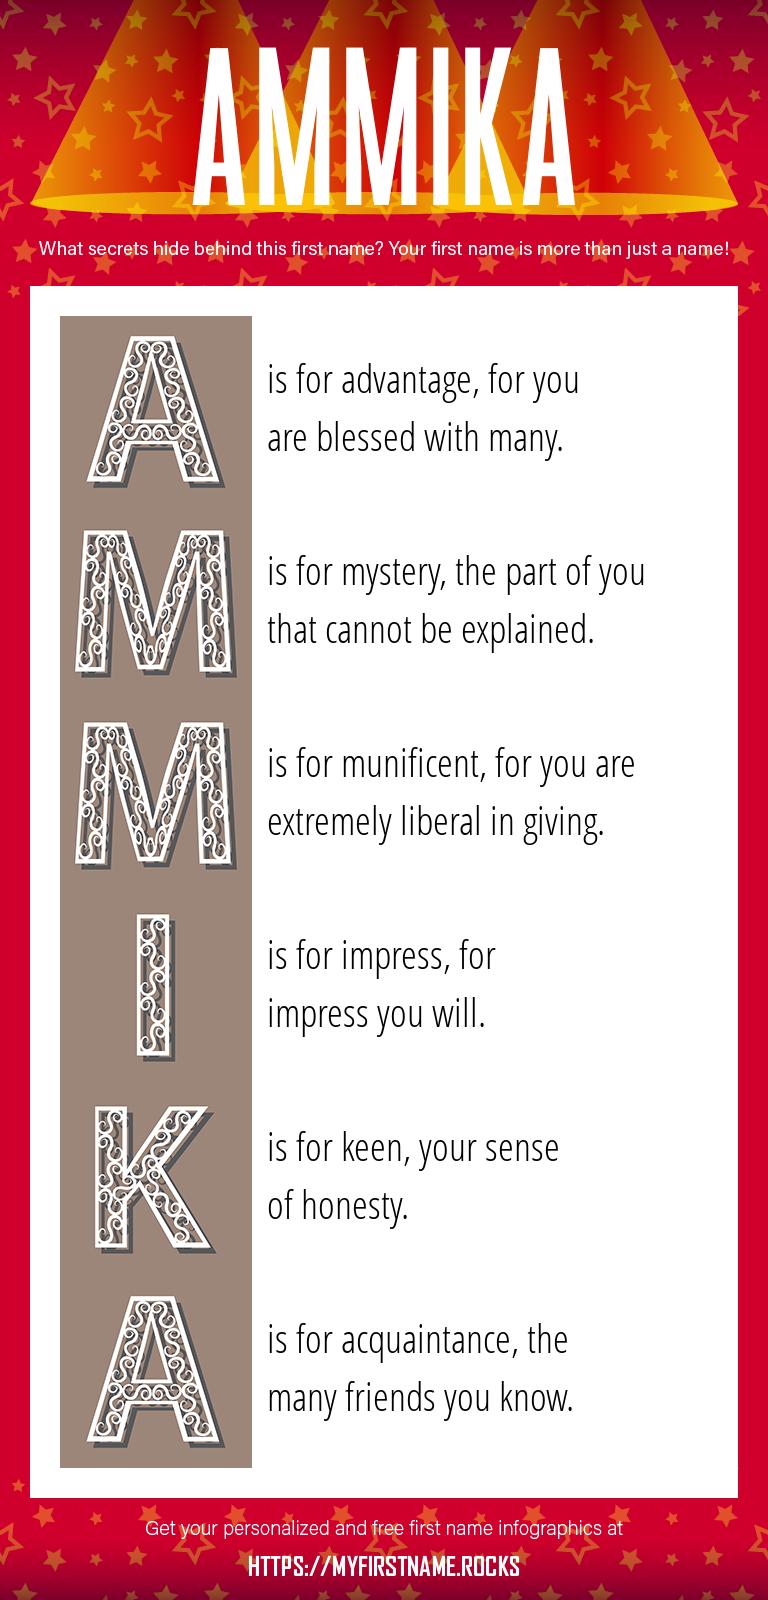 Ammika Infographics